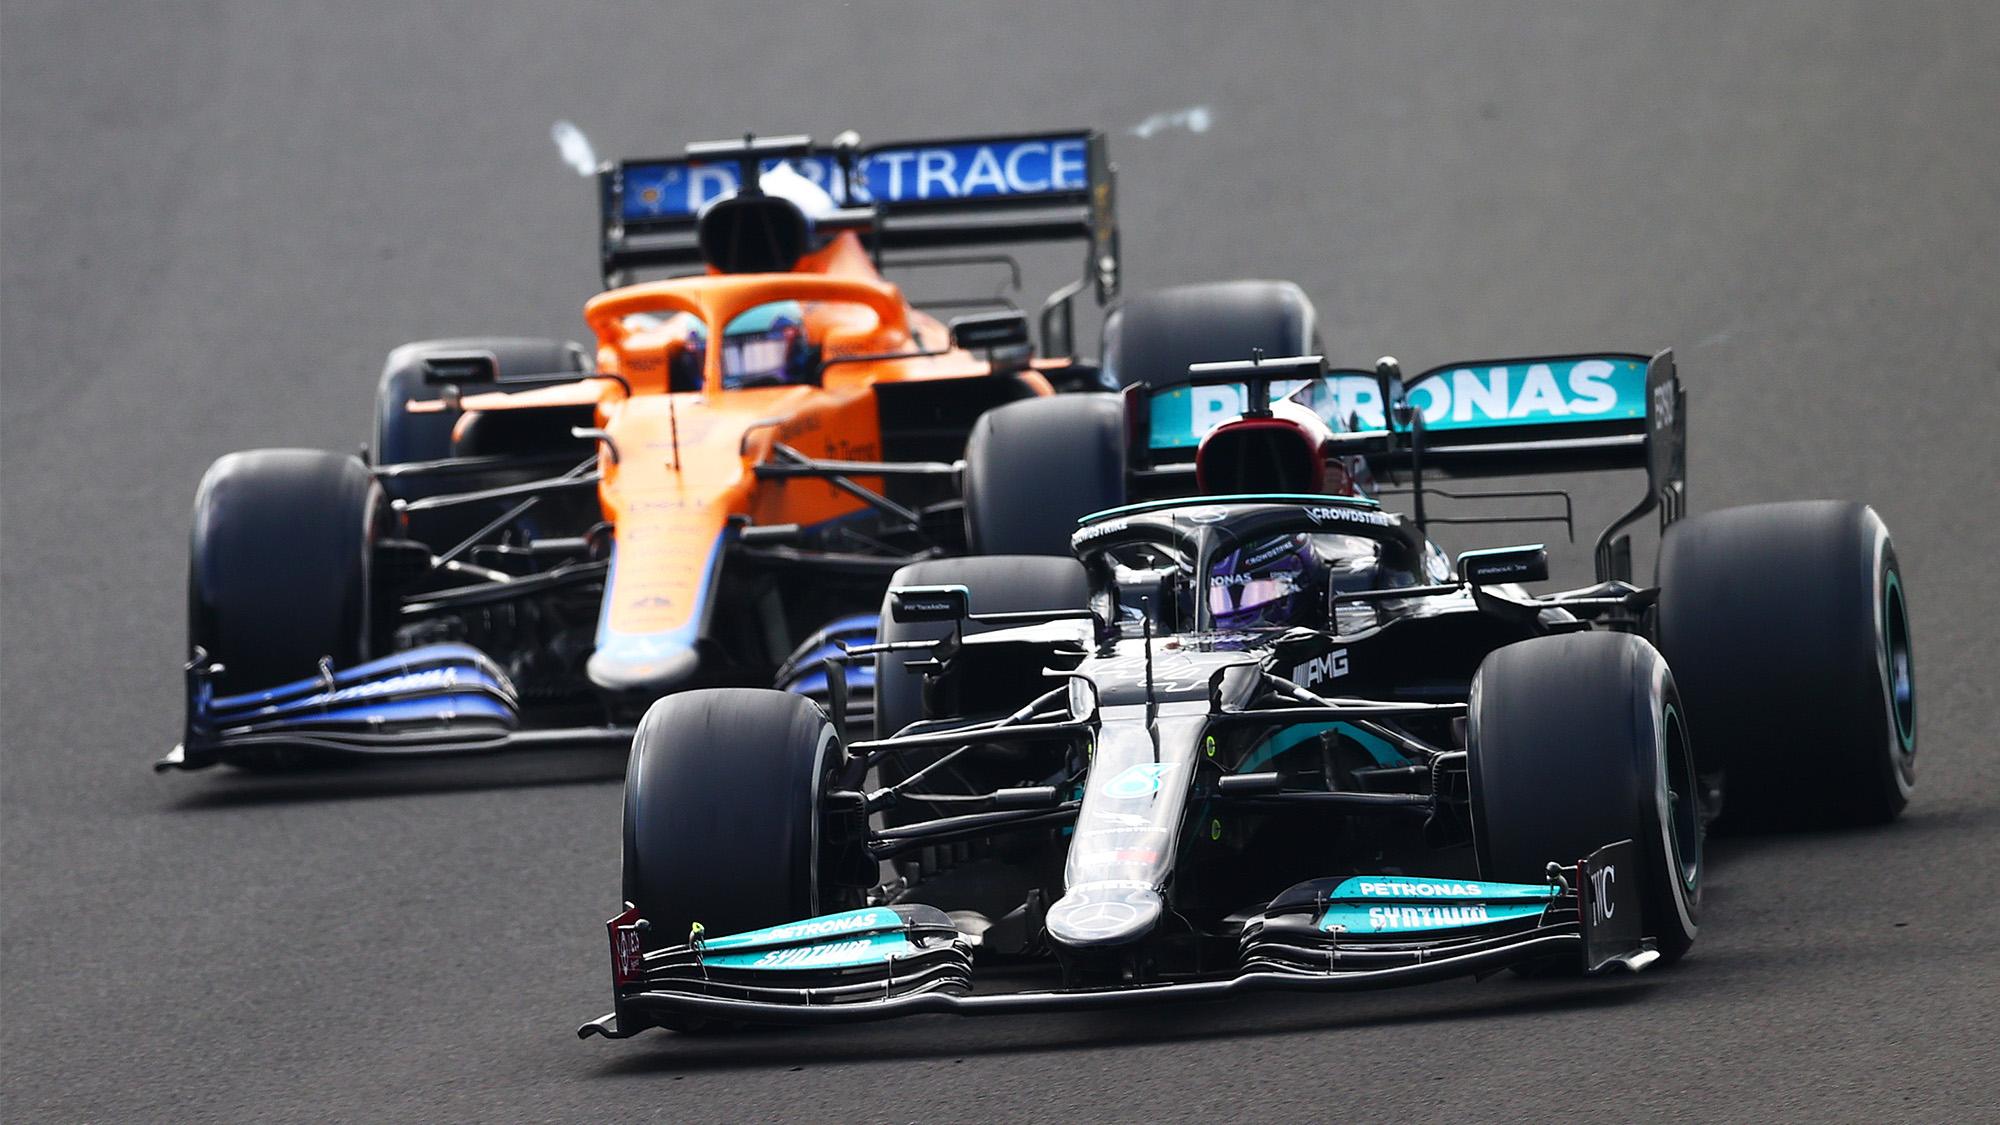 Lewis Hamilton overtakes Daniel Ricciardo at the 2021 Hungarian Grand Prix